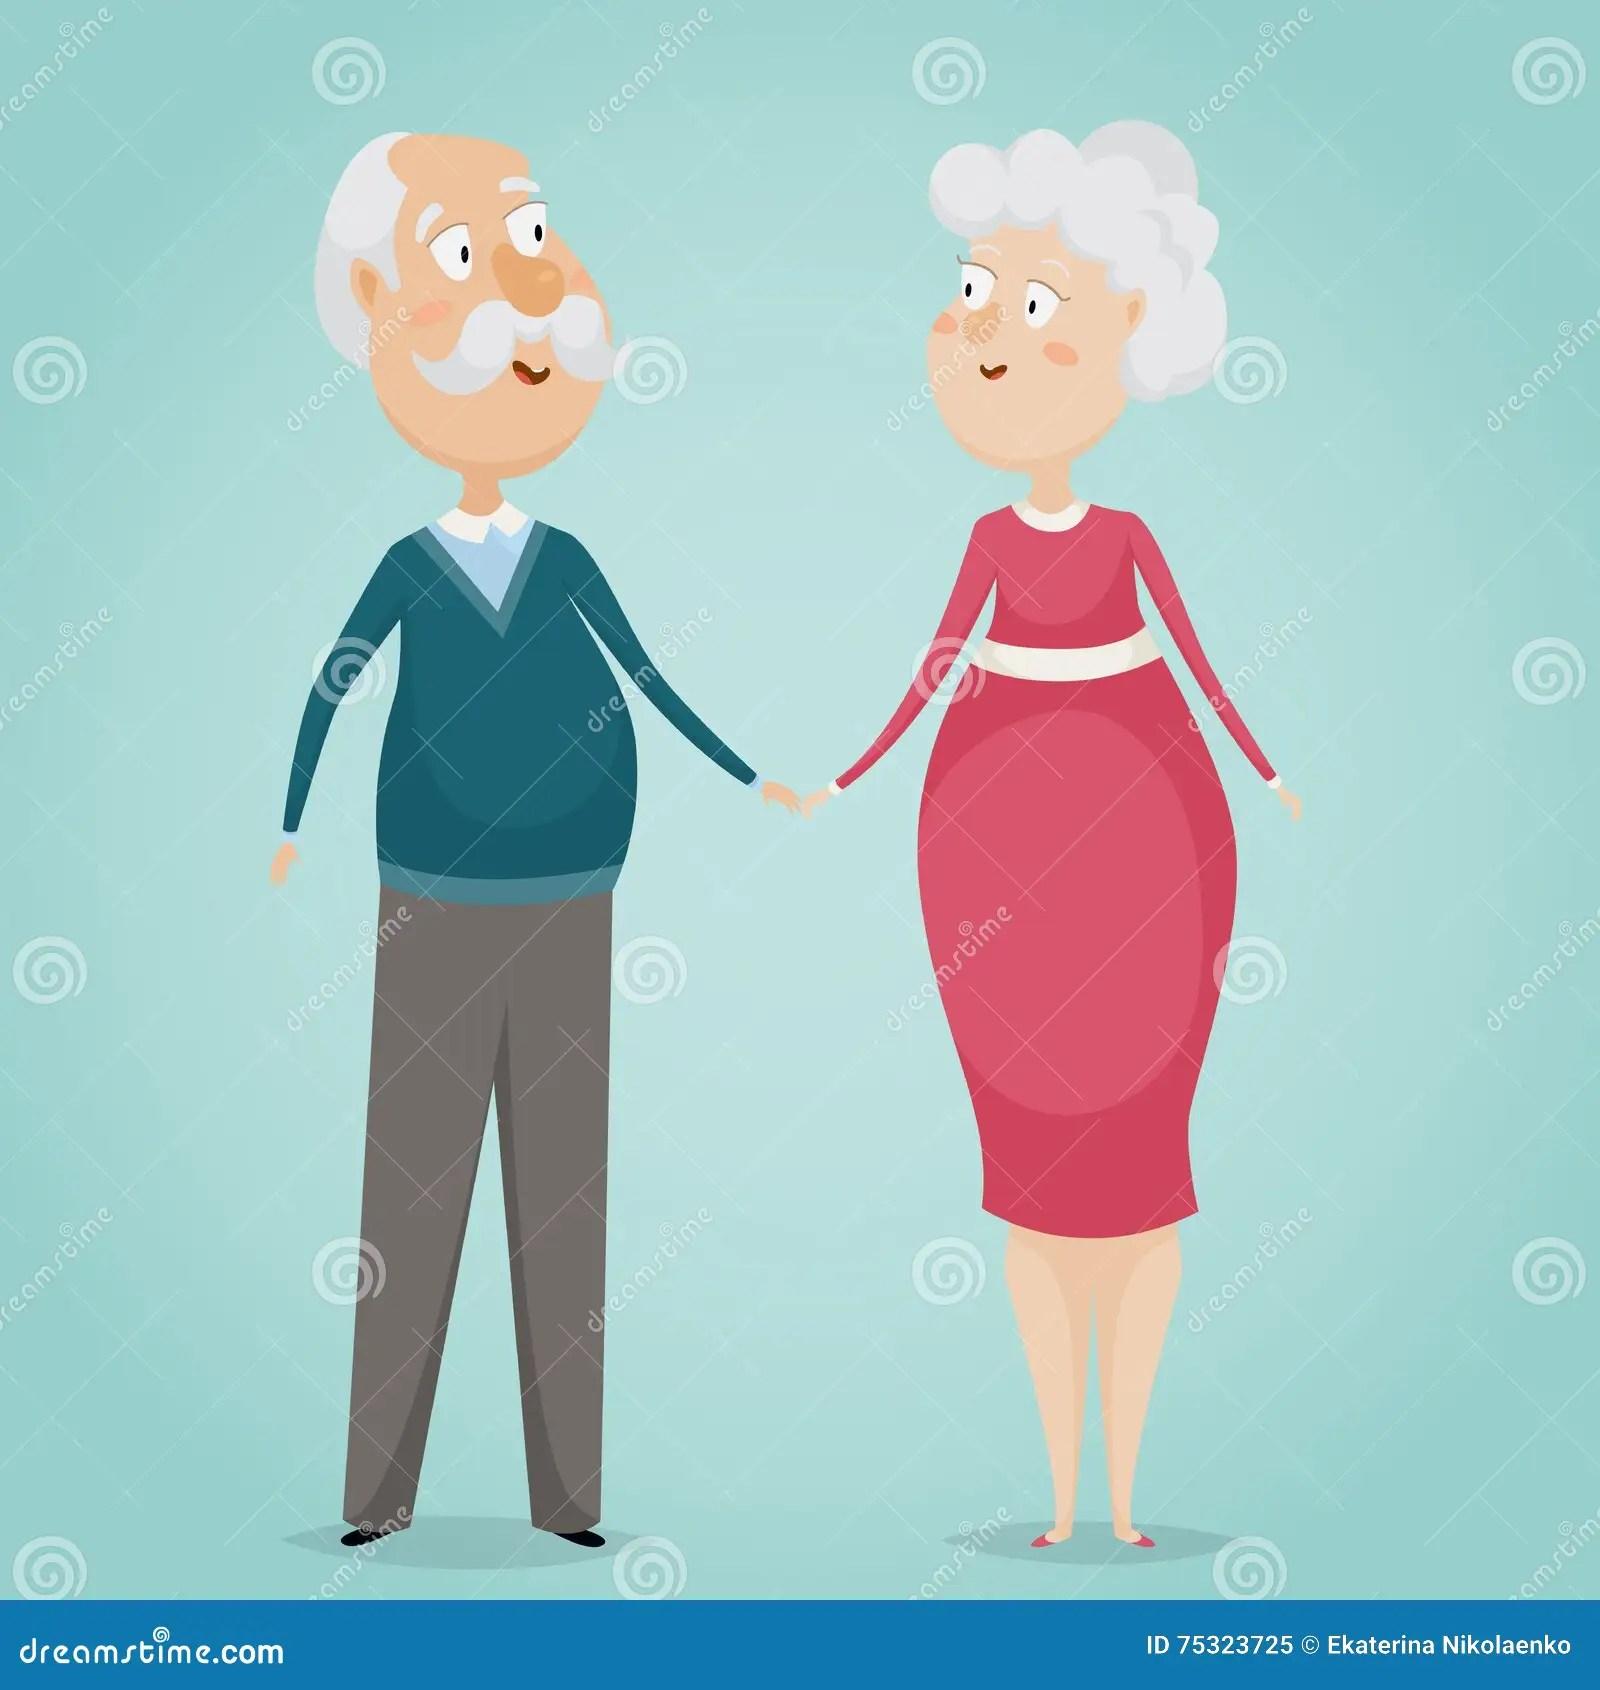 Cartoon People Holding Hands 2